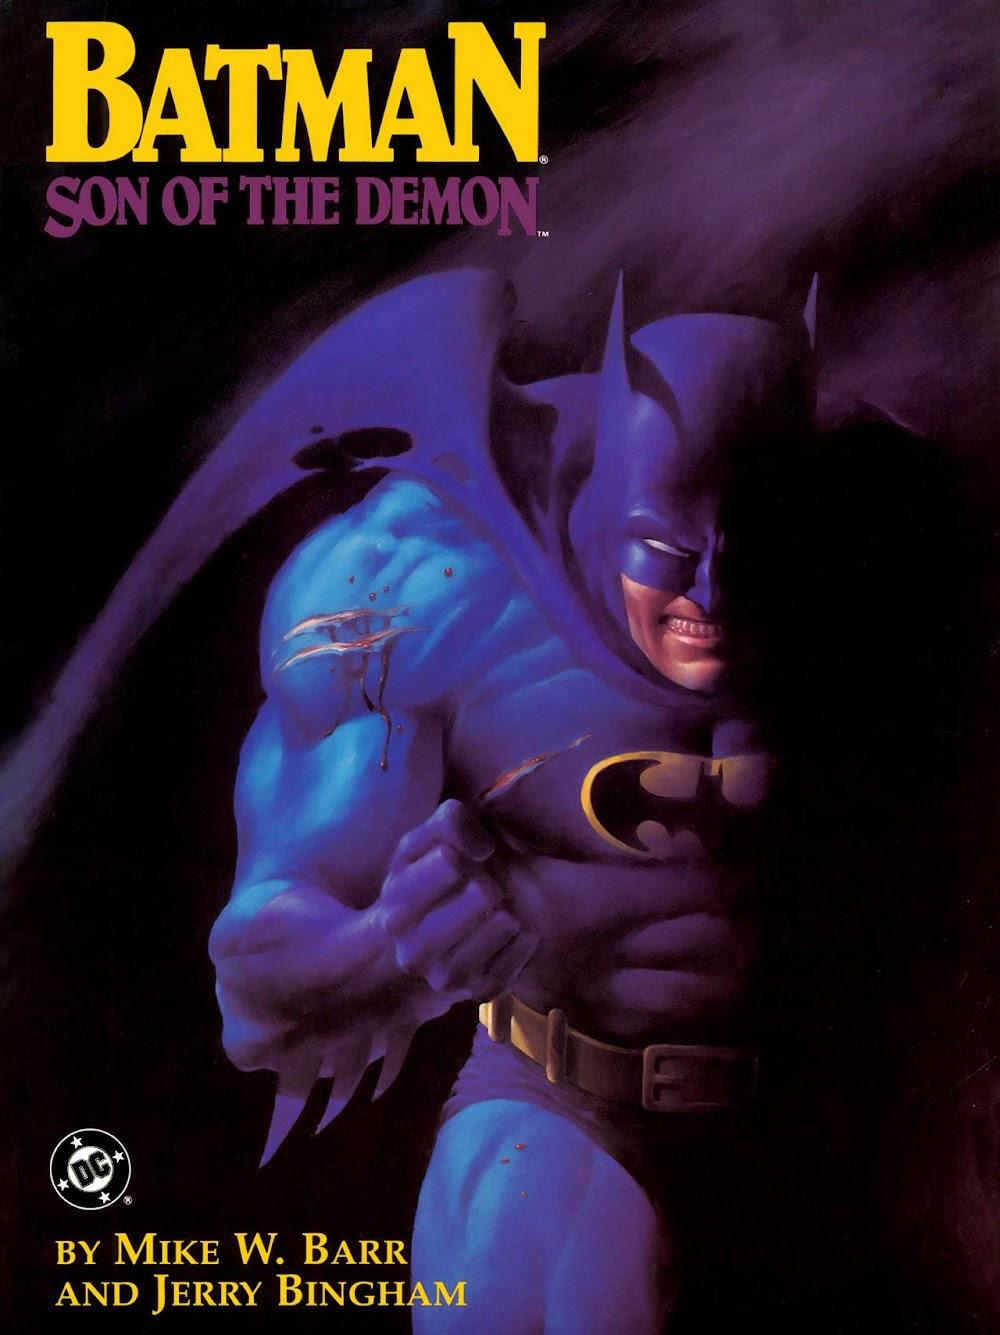 Batman - Son of the Demon (1987)